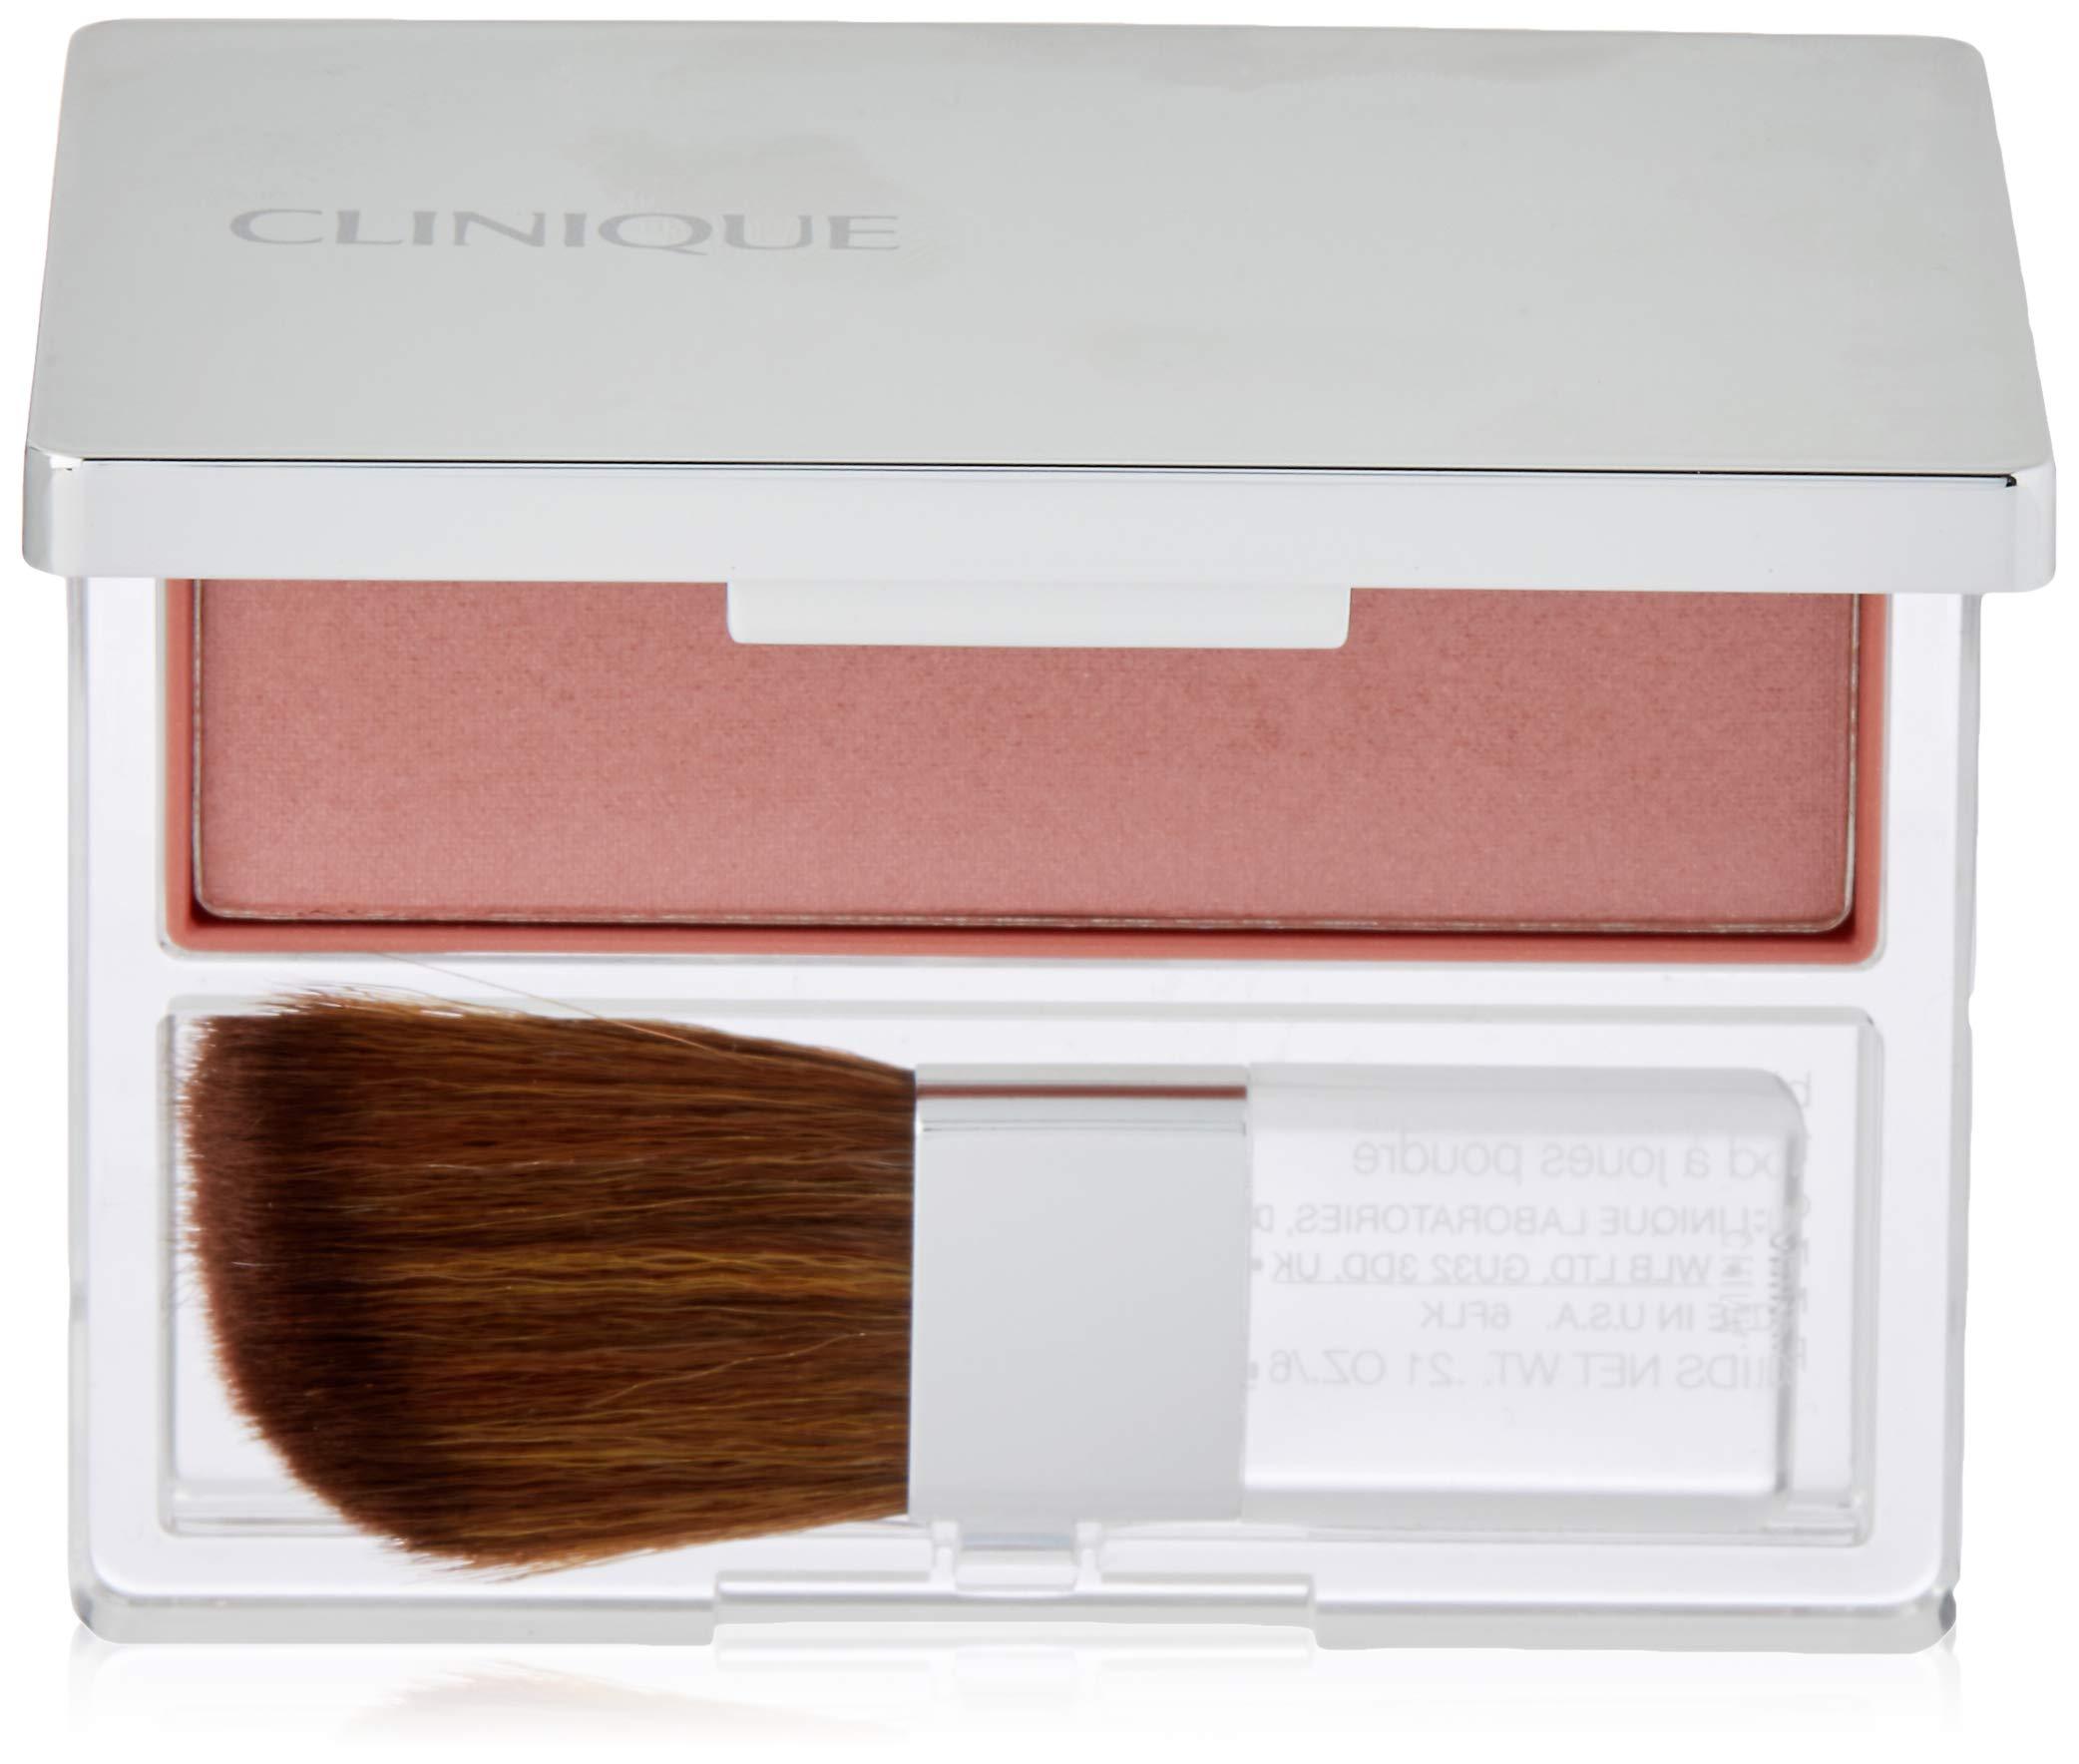 Clinique Blushing Blush Powder Blush, Sunset Glow, 0.21 Ounce by Clinique